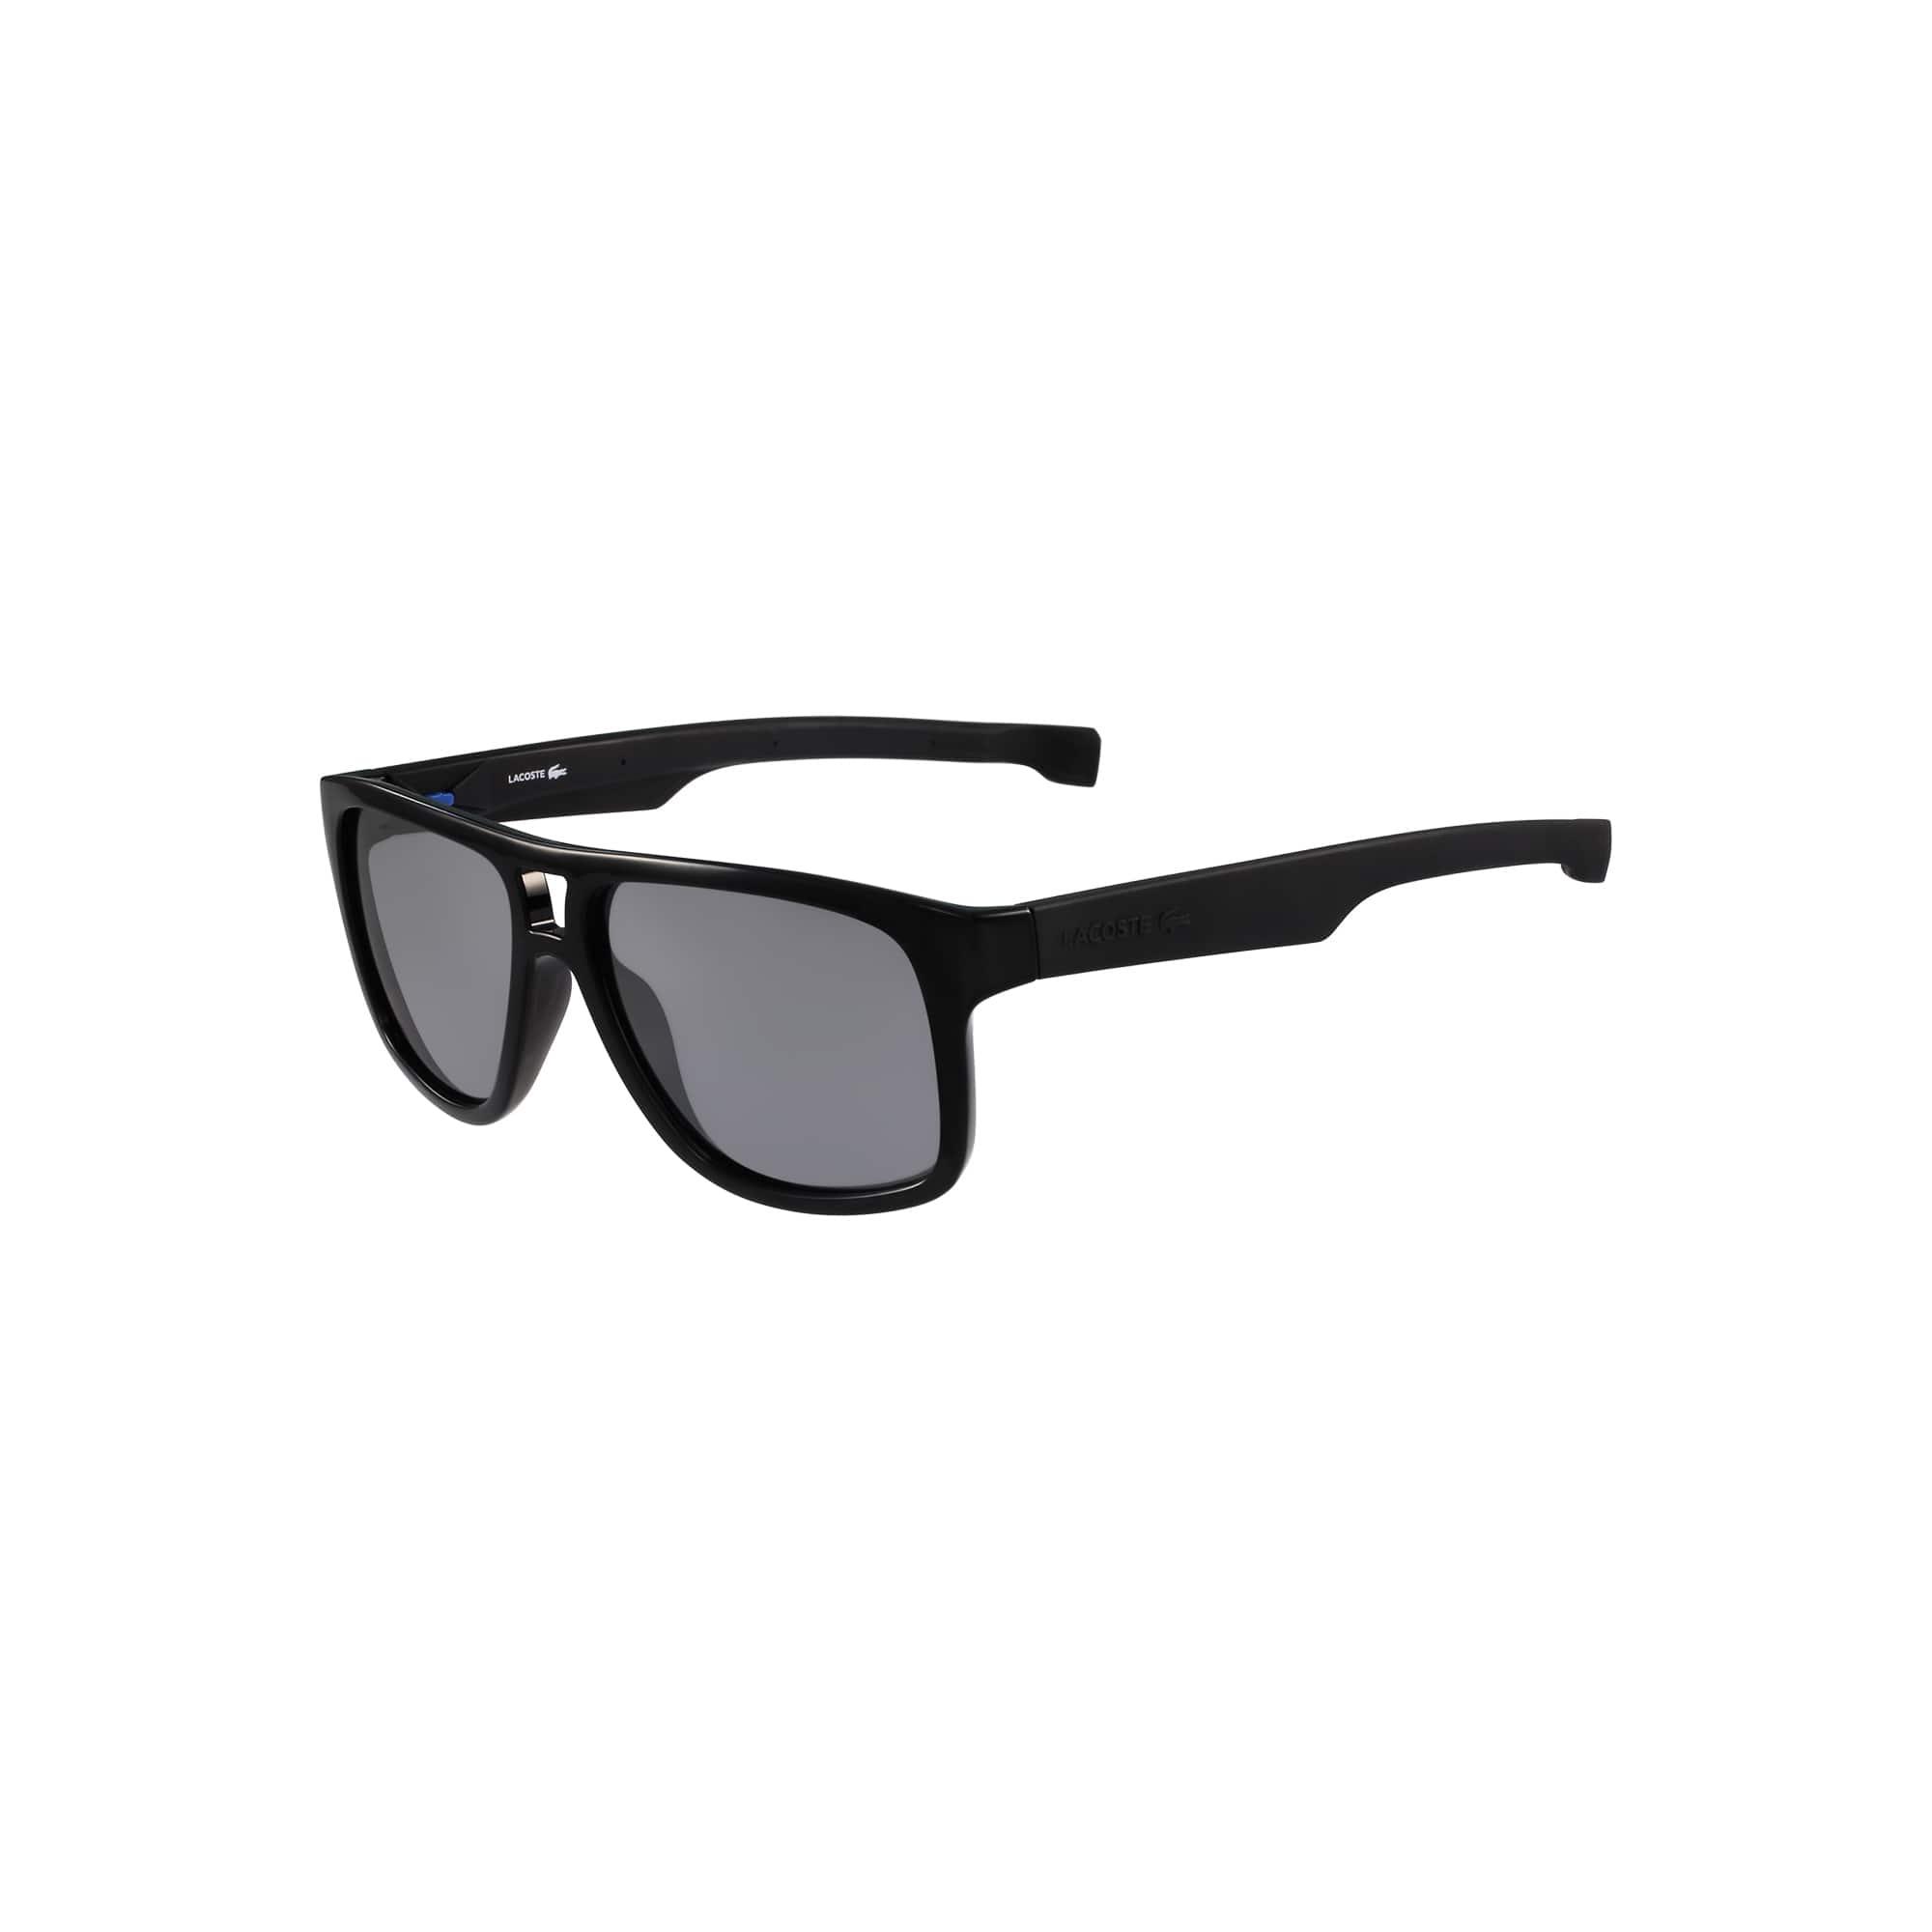 Sunglasses Magnetic Frame